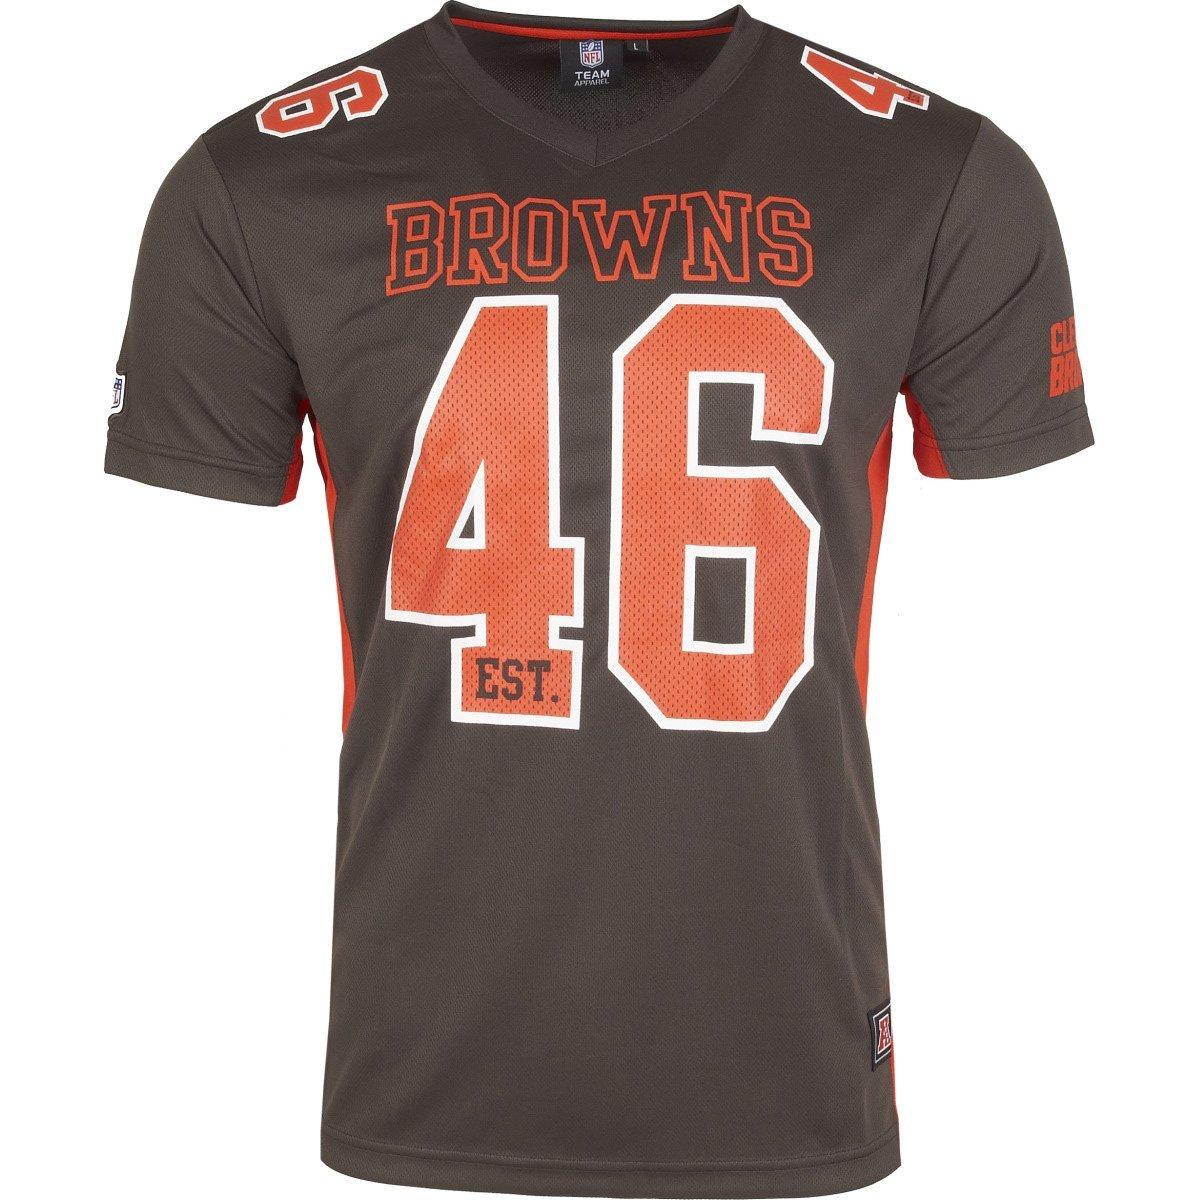 Majestic NFL Football Trikot Jersey Shirt Cleveland Brown majestic athletics